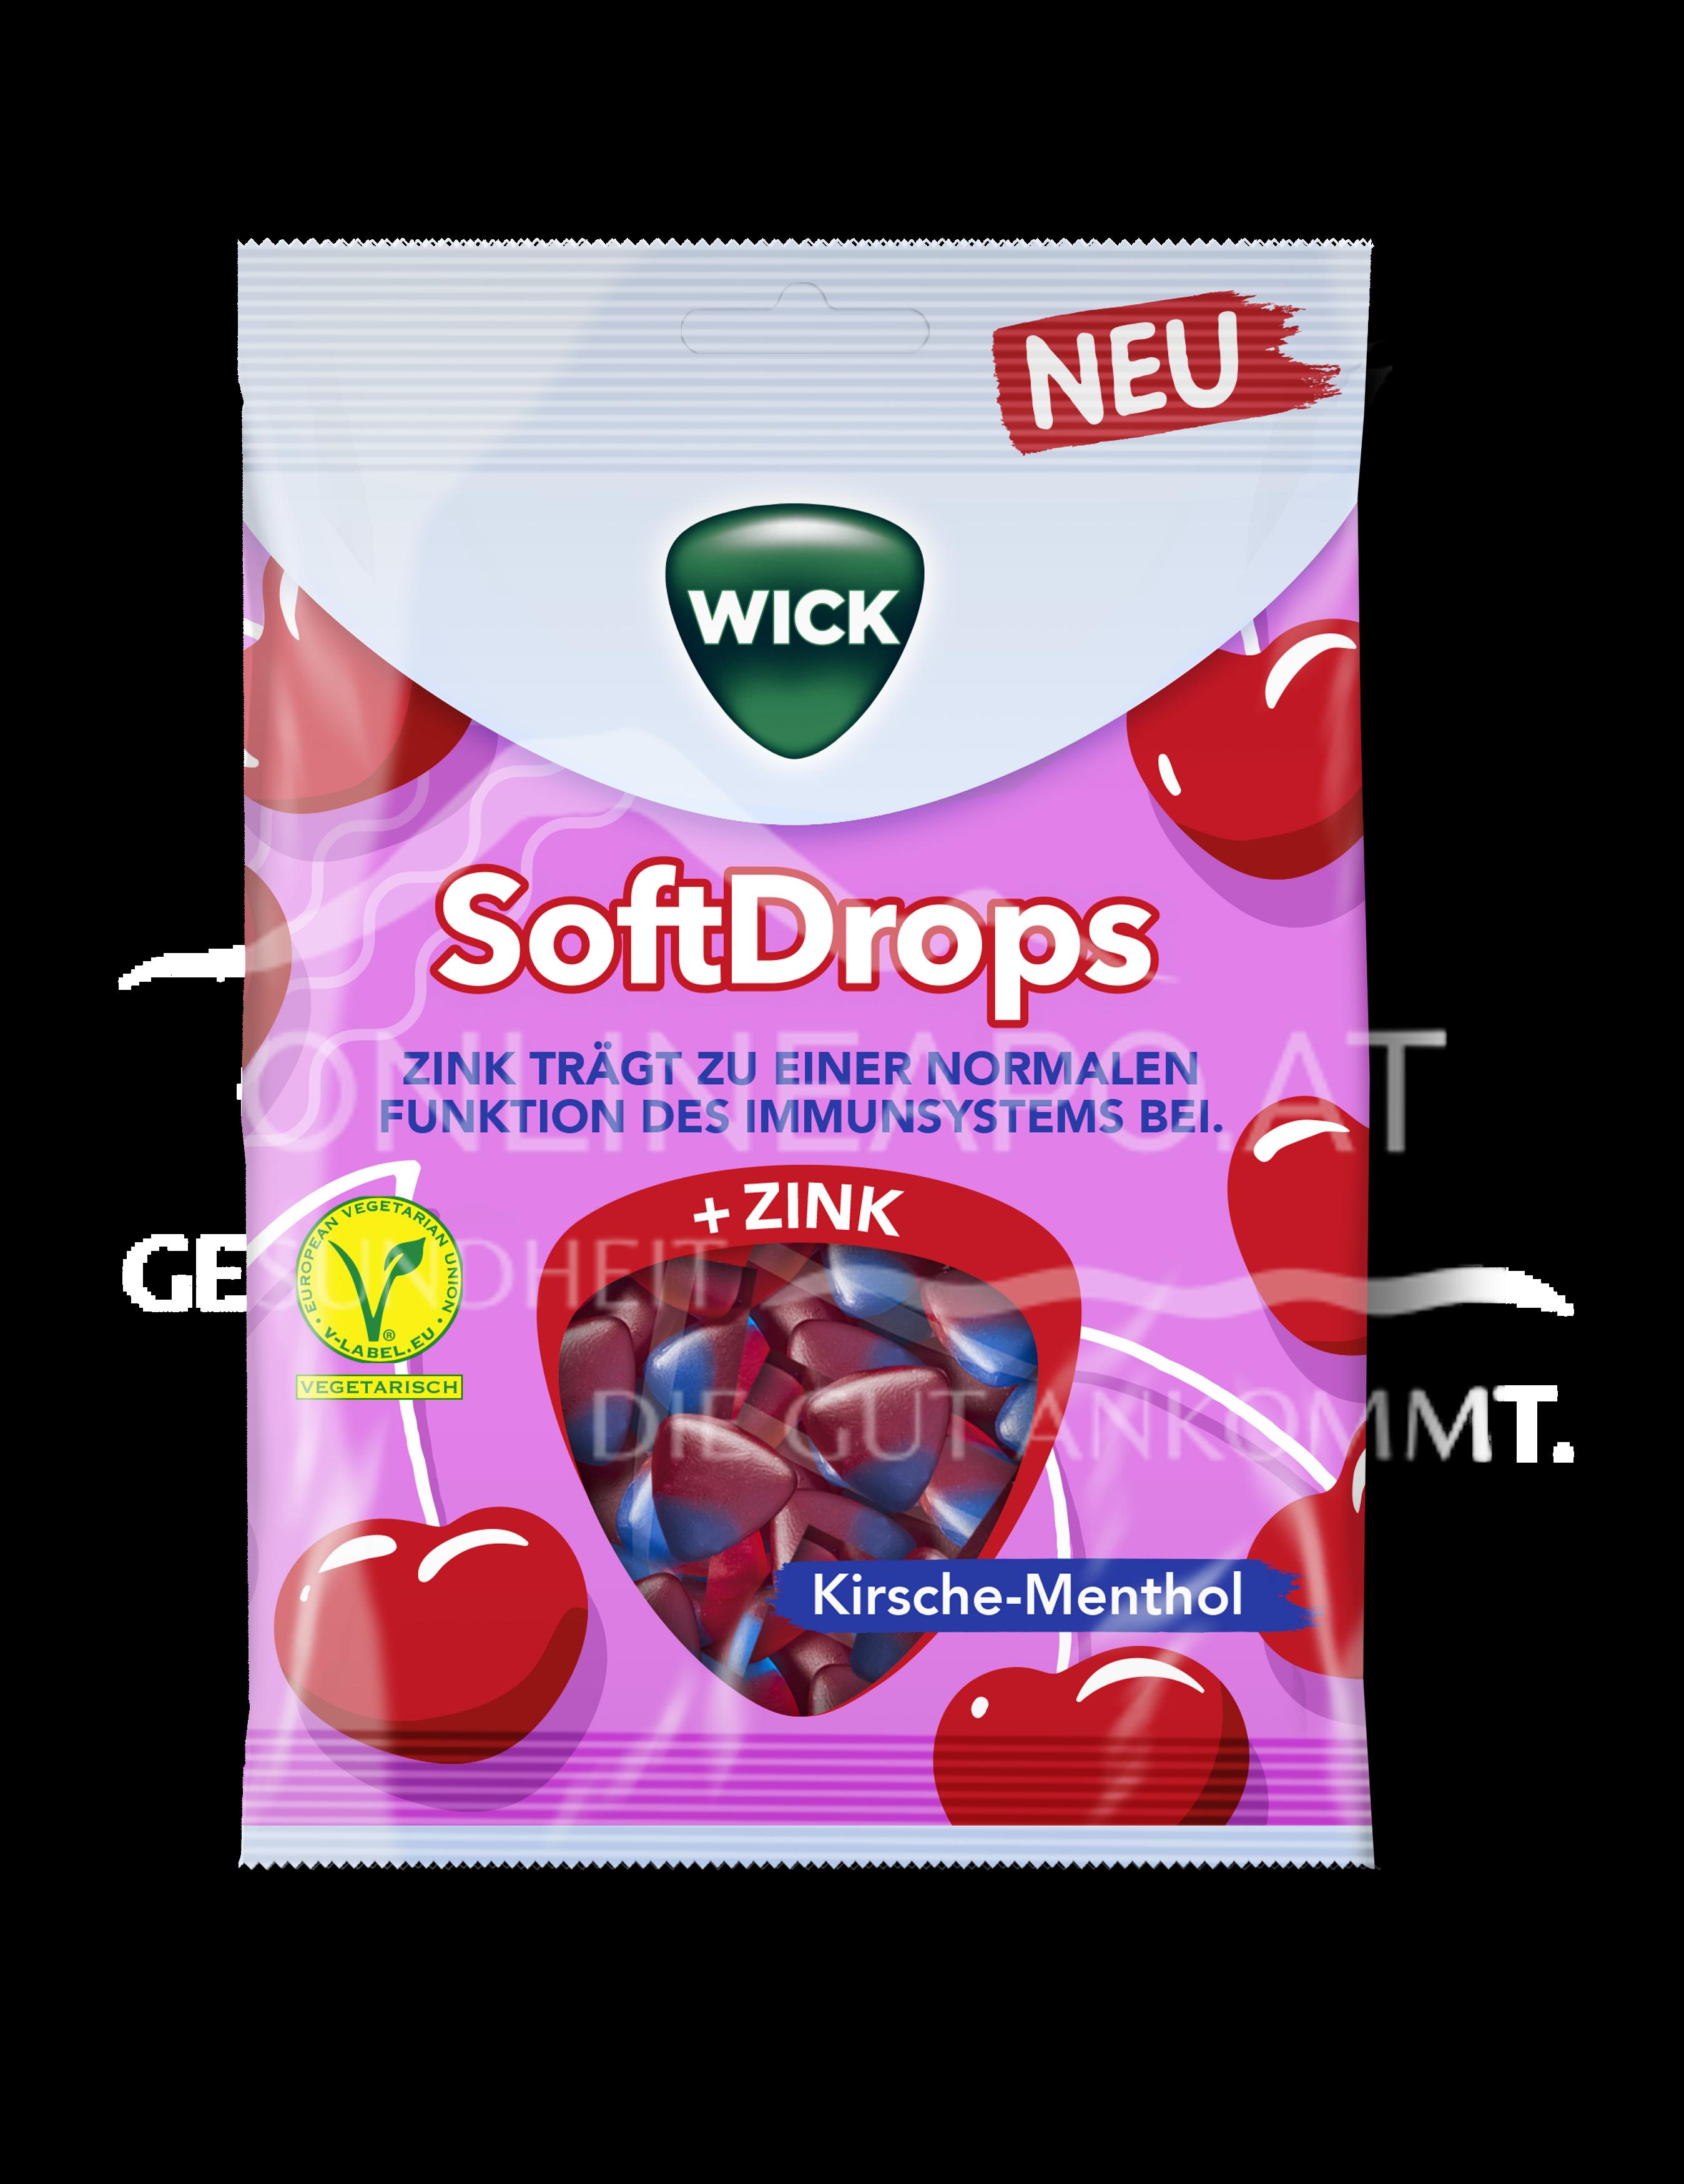 Wick Softdrops Wetterfest Kirsche-Menthol Zink